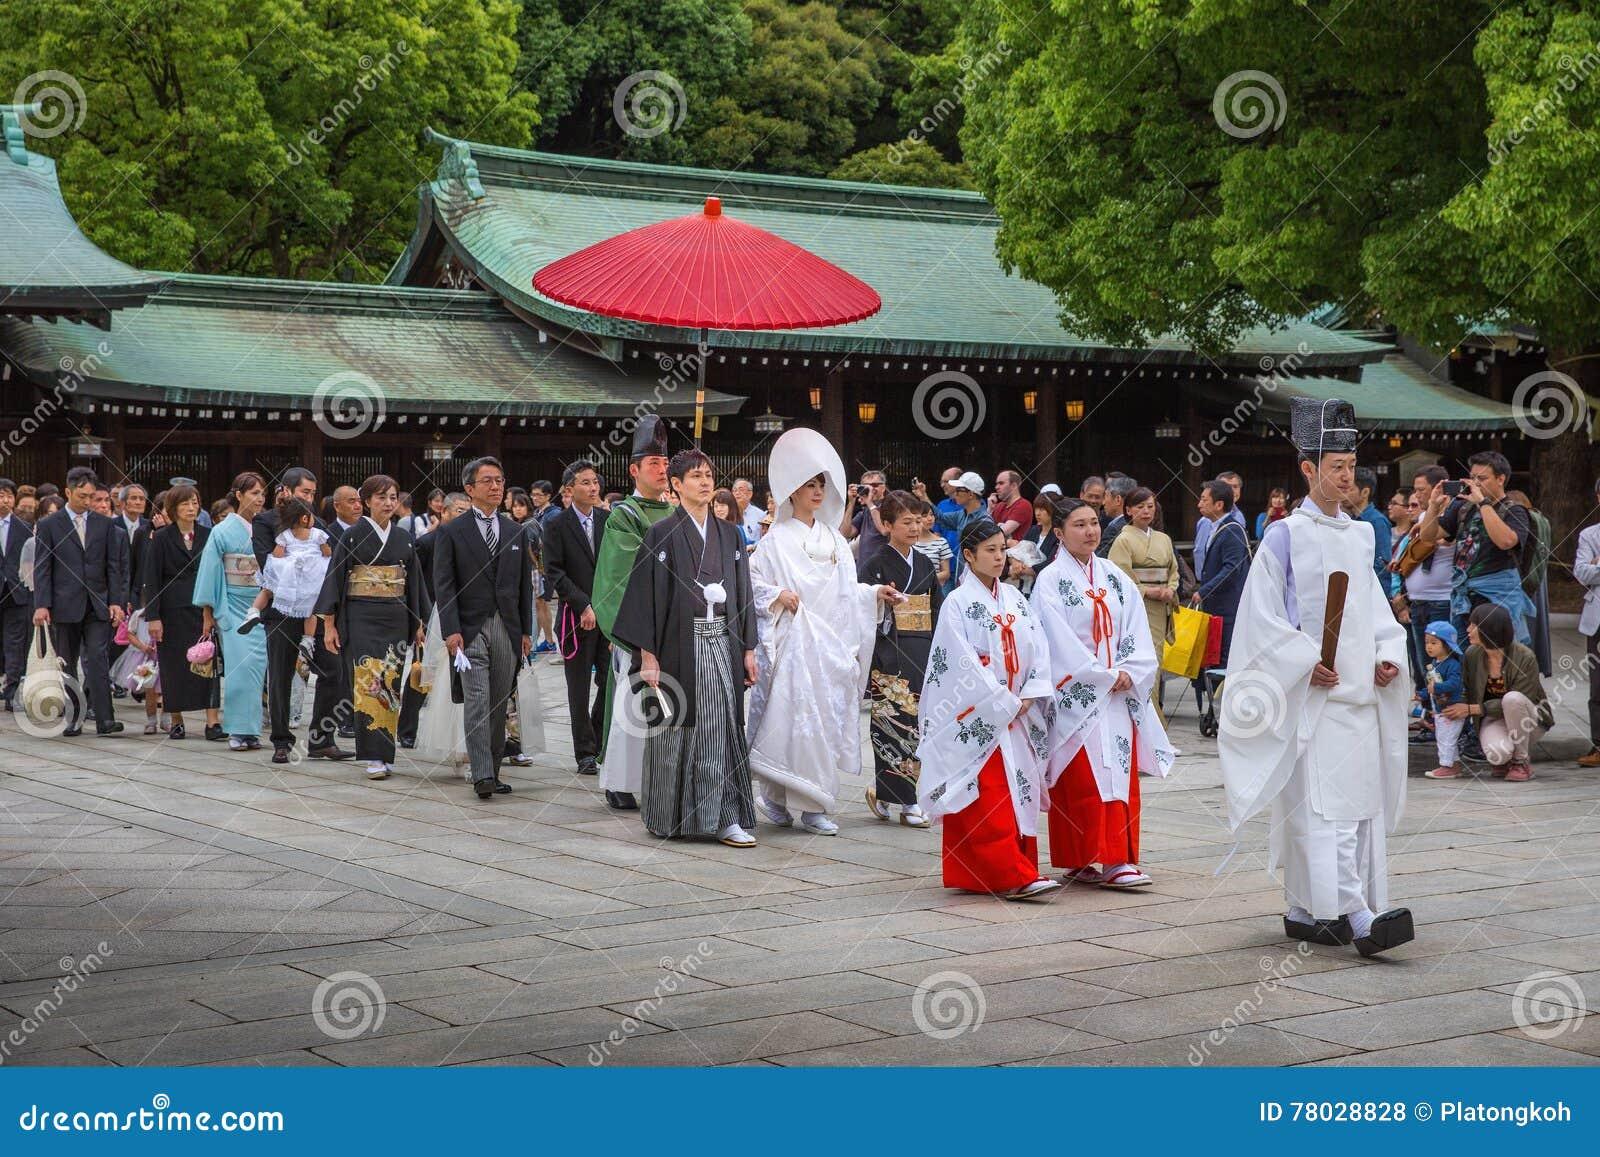 A Traditional Japanese Wedding Ceremony At Meiji Jingu Shrine Editorial Stock Photo